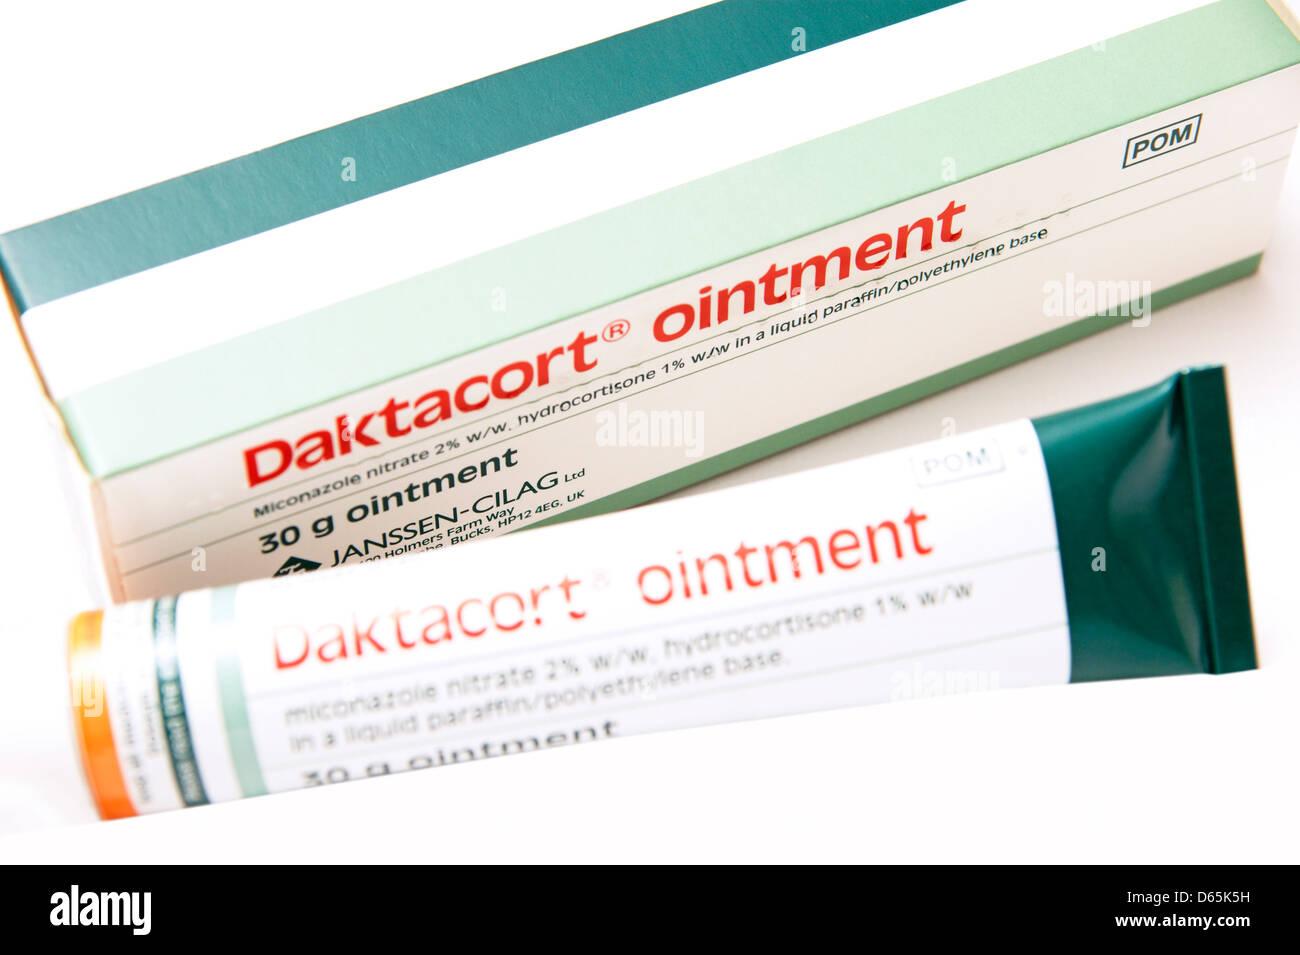 Hydrocortisone Cream Stock Photos & Hydrocortisone Cream